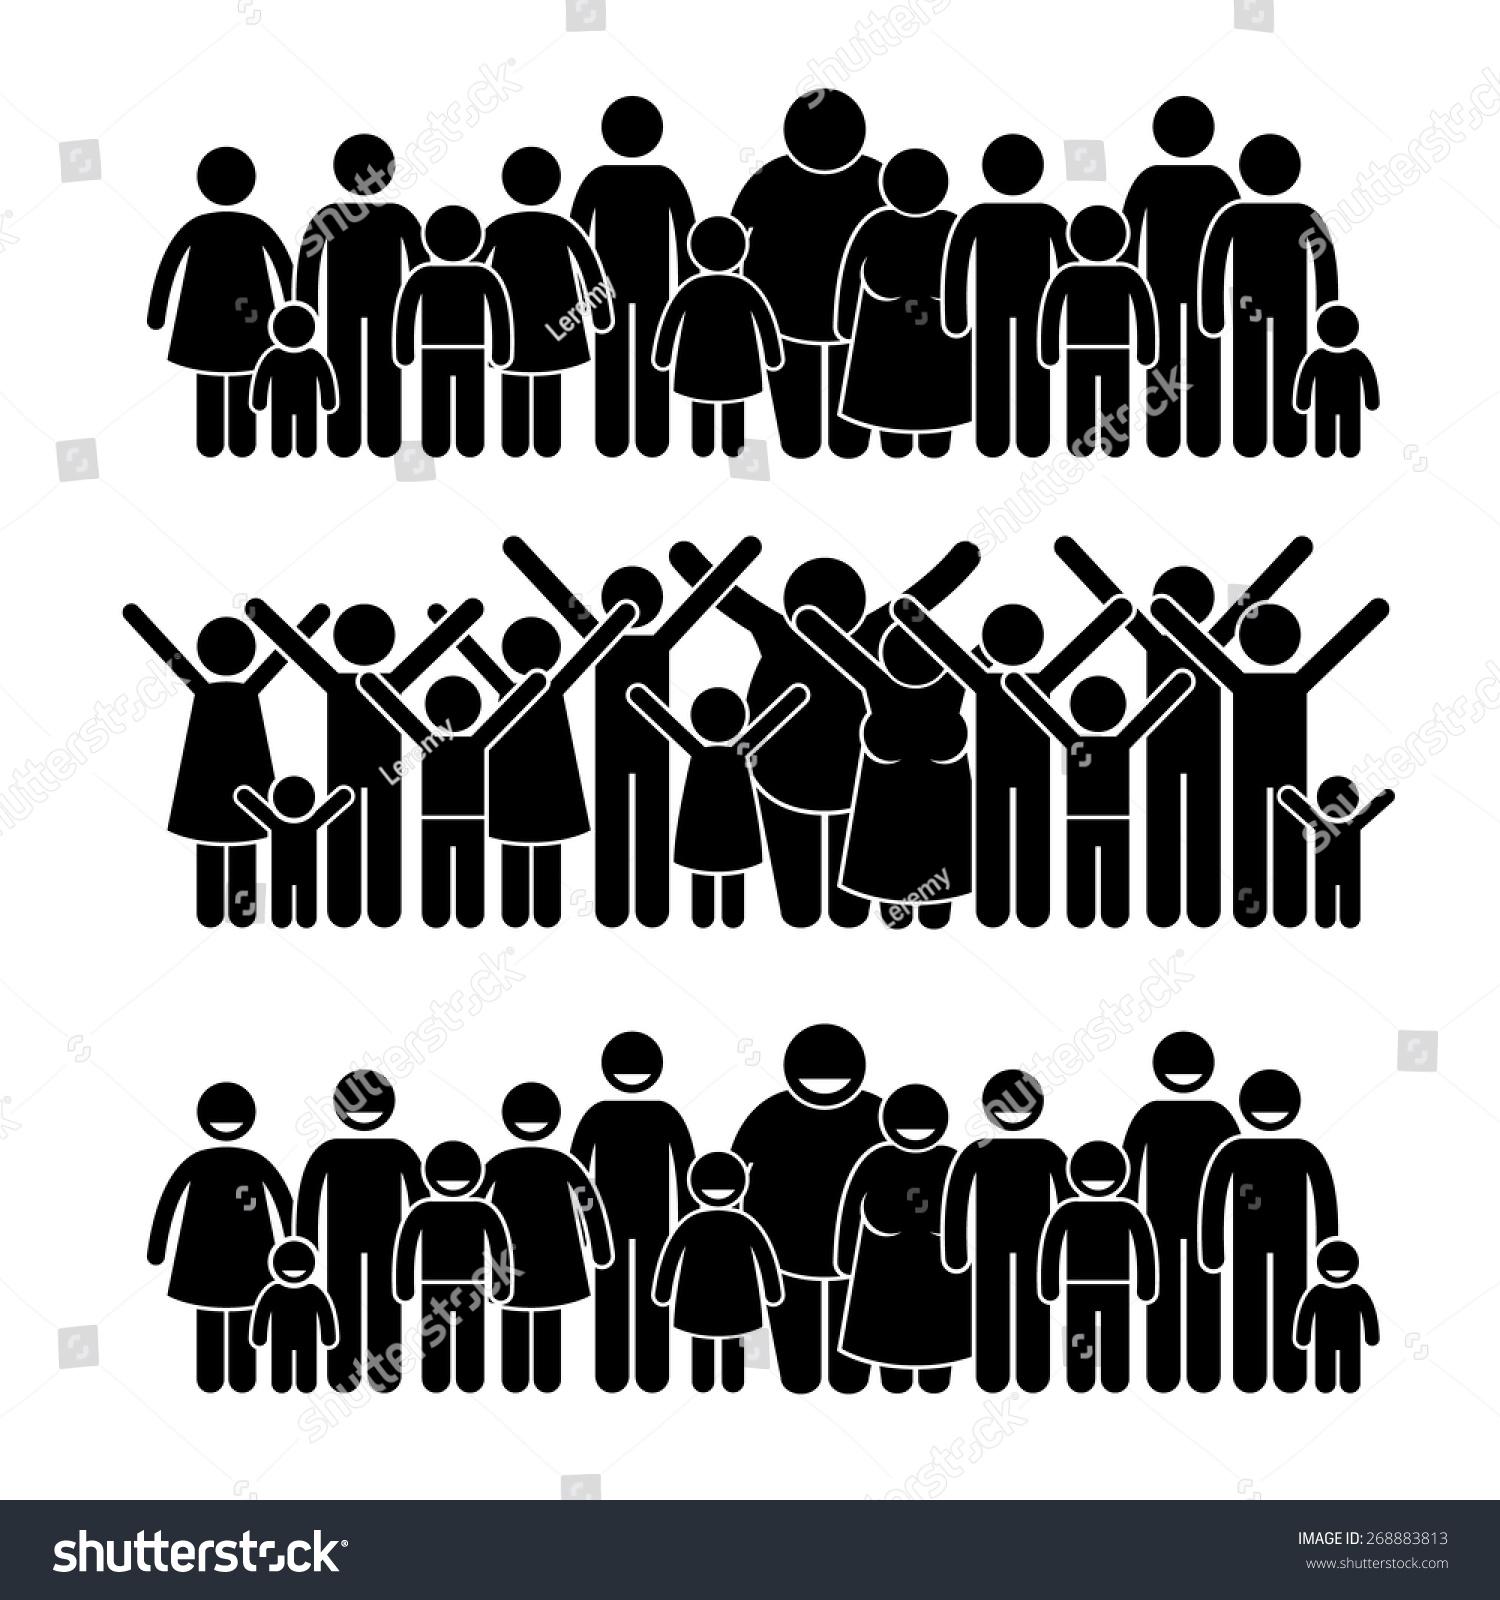 Group People Standing Community Stick Figure Stock Vector ... Raising Children